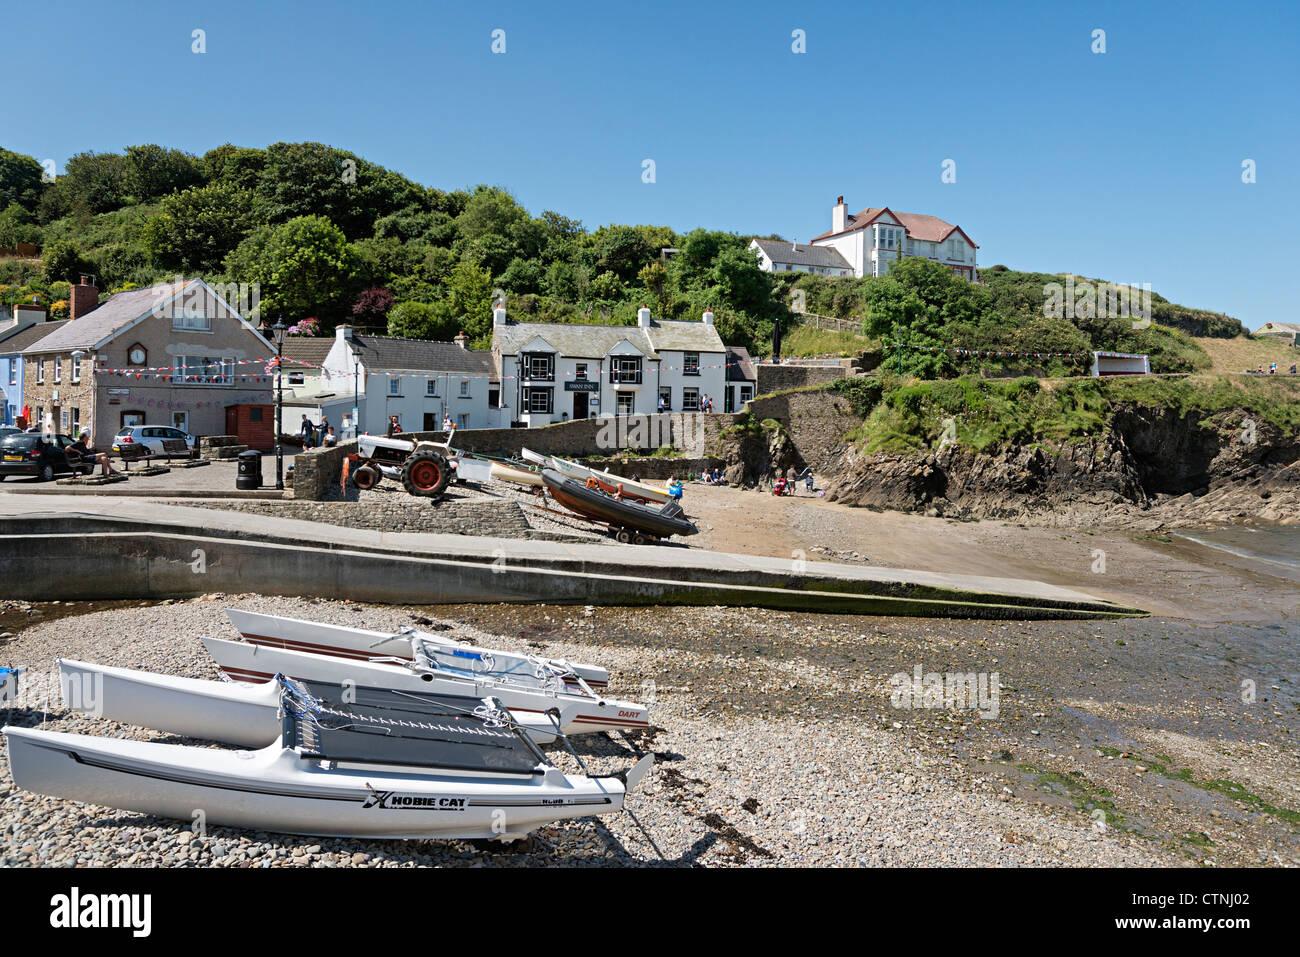 Little Haven beach Pembrokeshire Wales - Stock Image